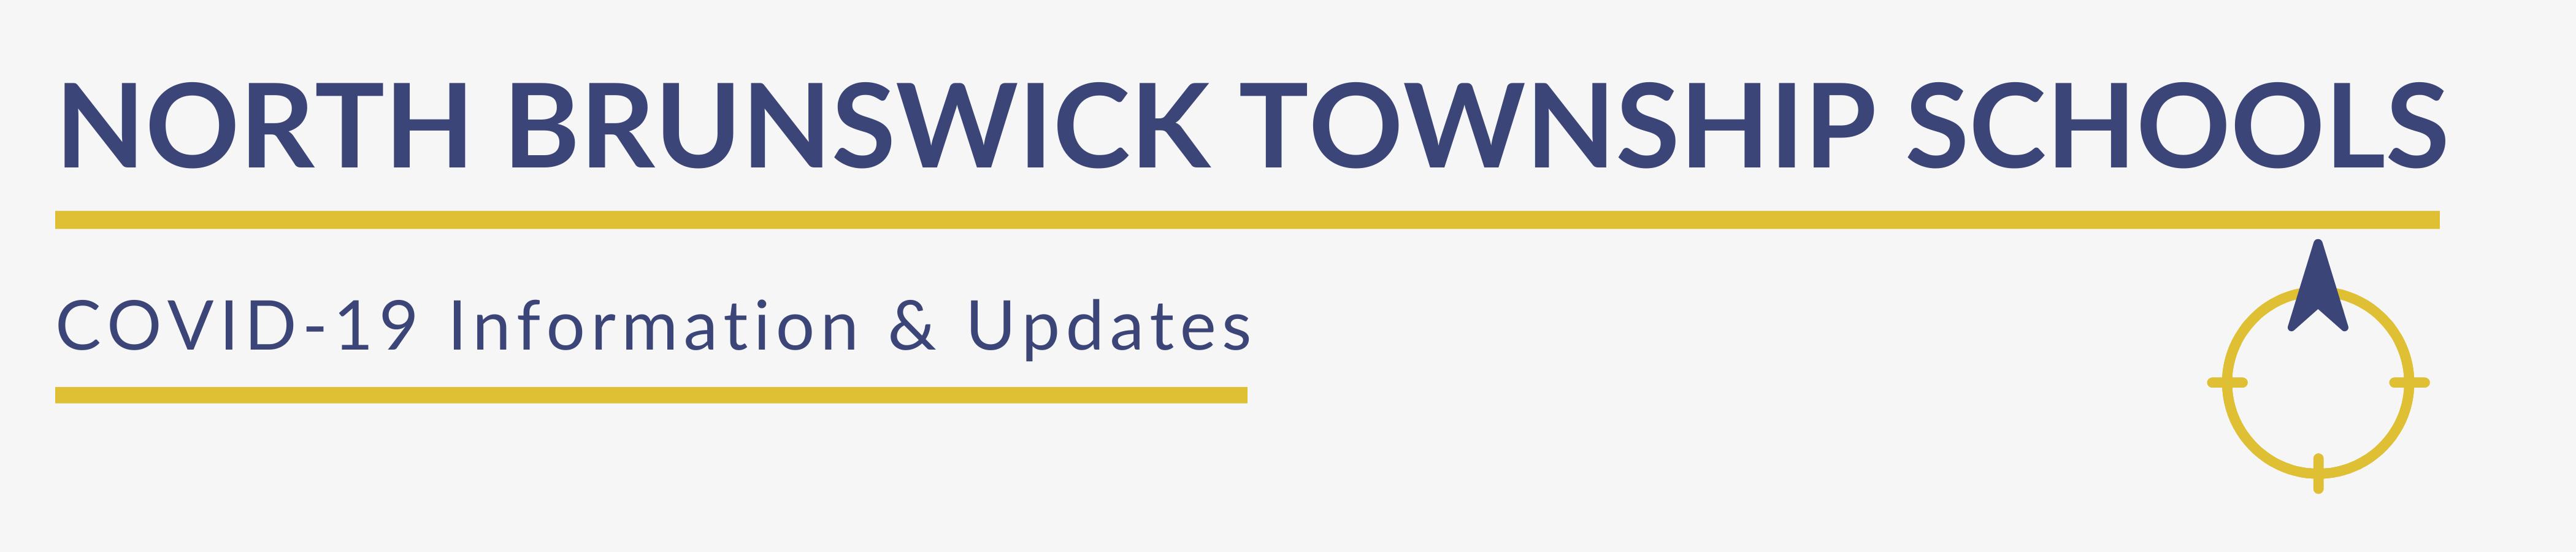 NORTH BRUNSWICK TOWNSHIP SCHOOLS - COVID-19 INFORMATION & UPDATES